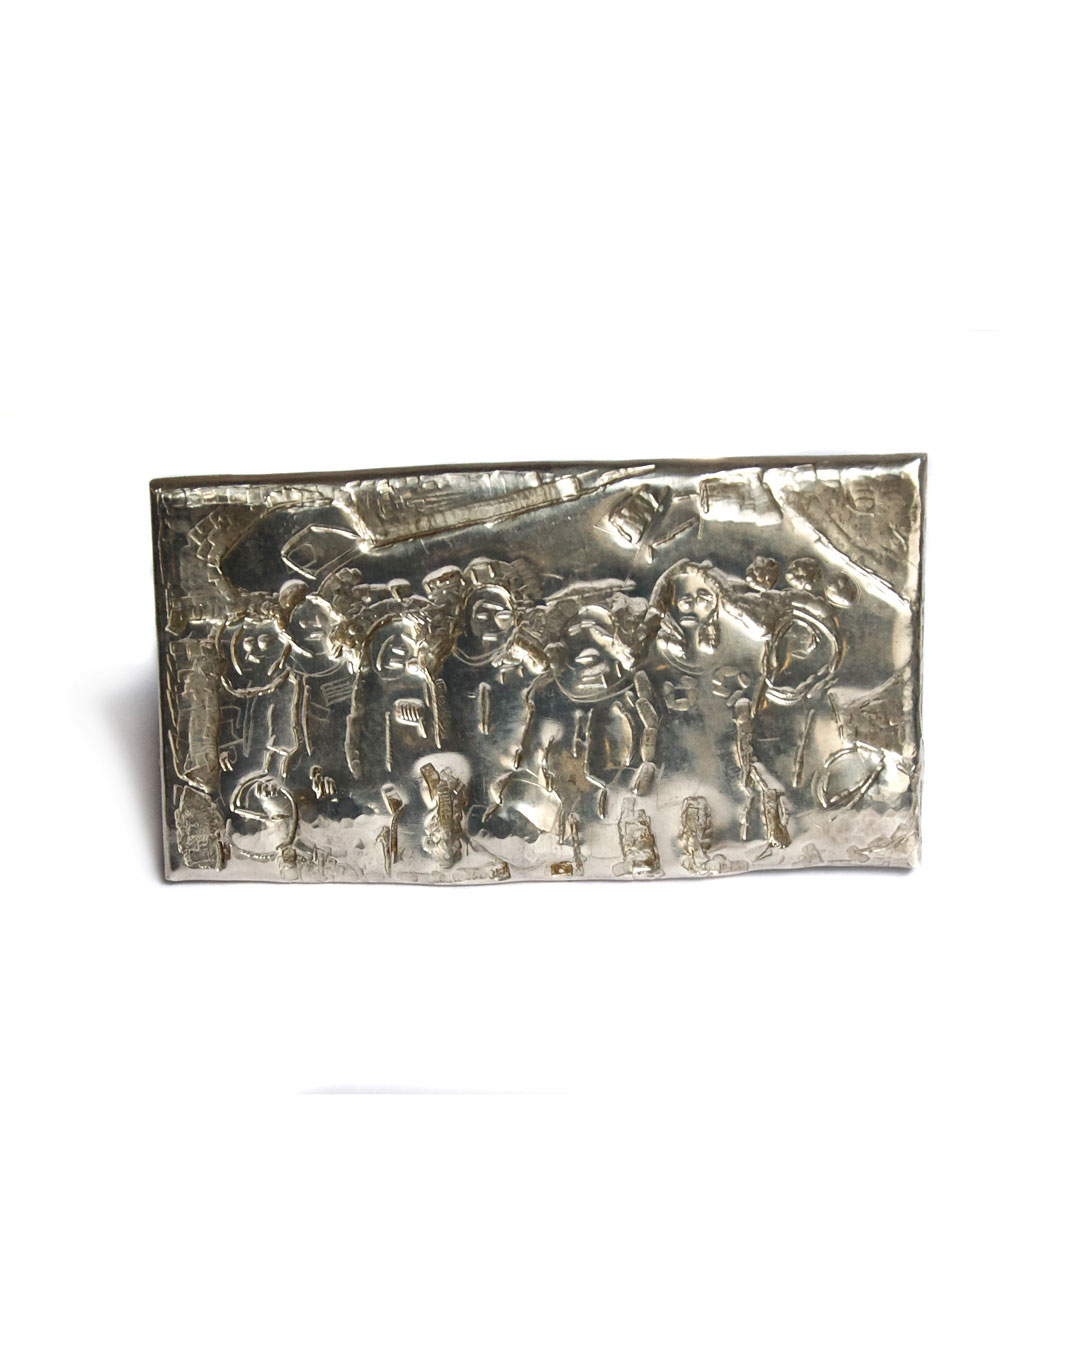 Rudolf Kocéa, Astronauten, 2007, broche; zilver, 55 x 105 x 5 mm, €1535